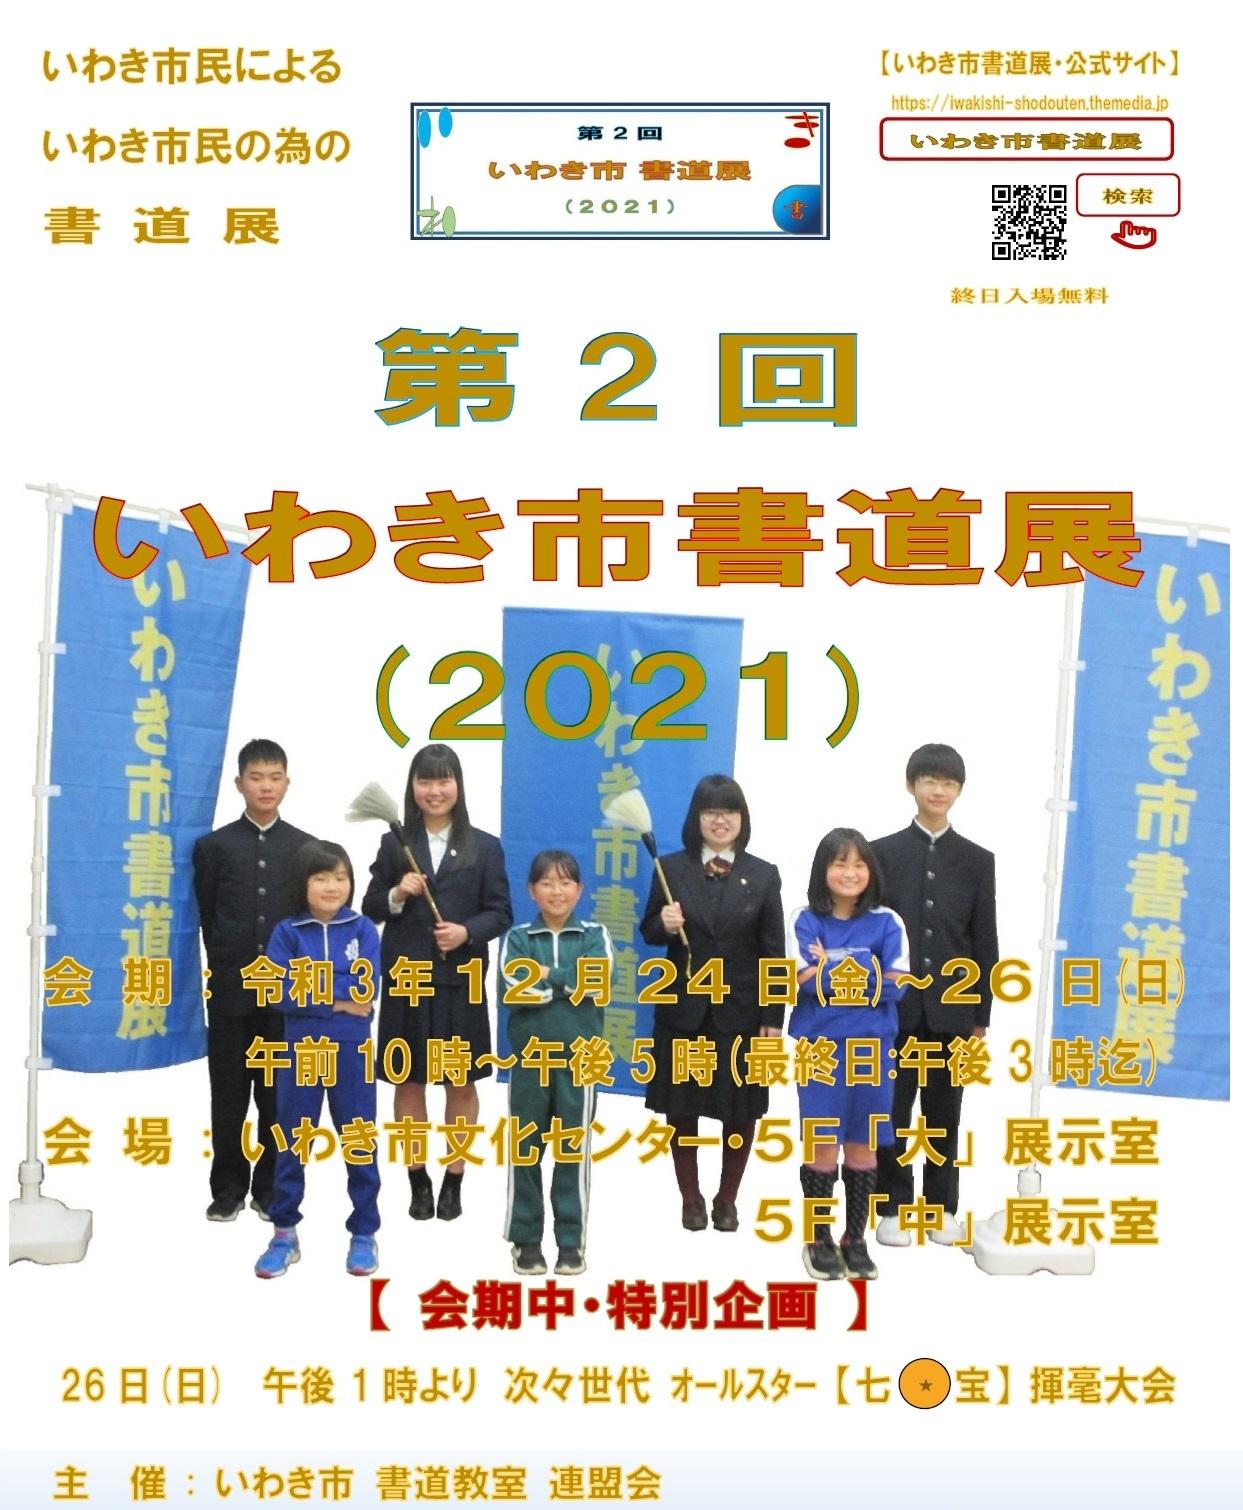 2nd-iwakishi-shodouten-poster-2021-0609 - コピー